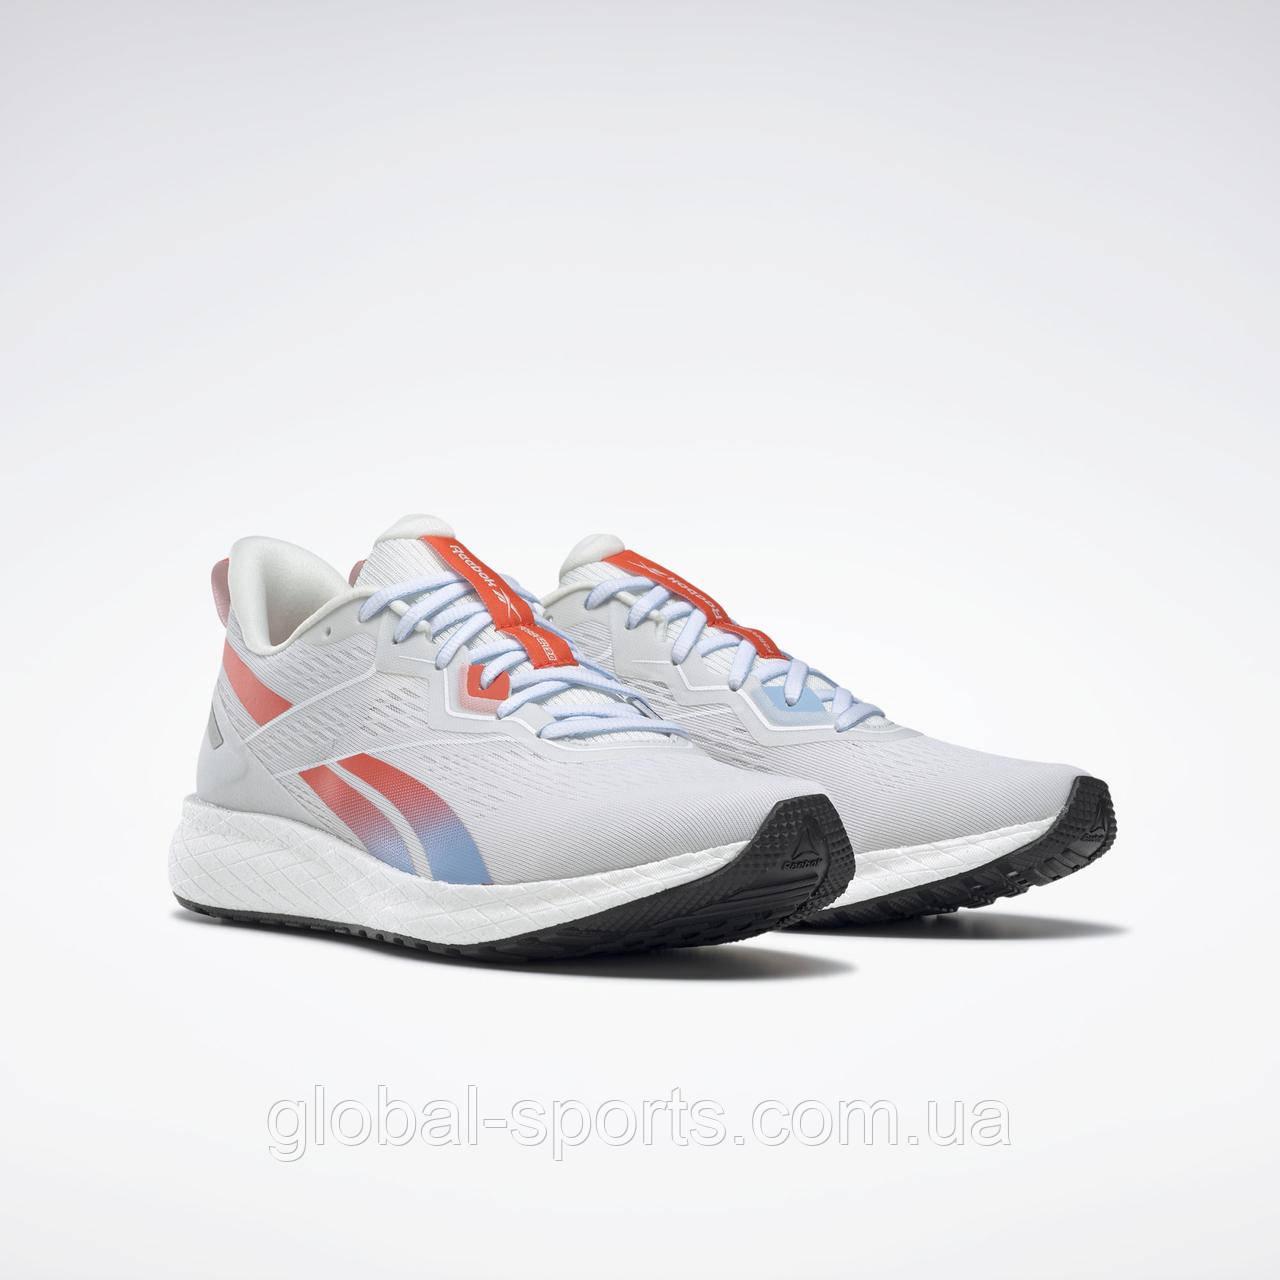 Мужсике кросівки Reebok Forever Floatride Energy 2.0 W(Артикул:EF6912)